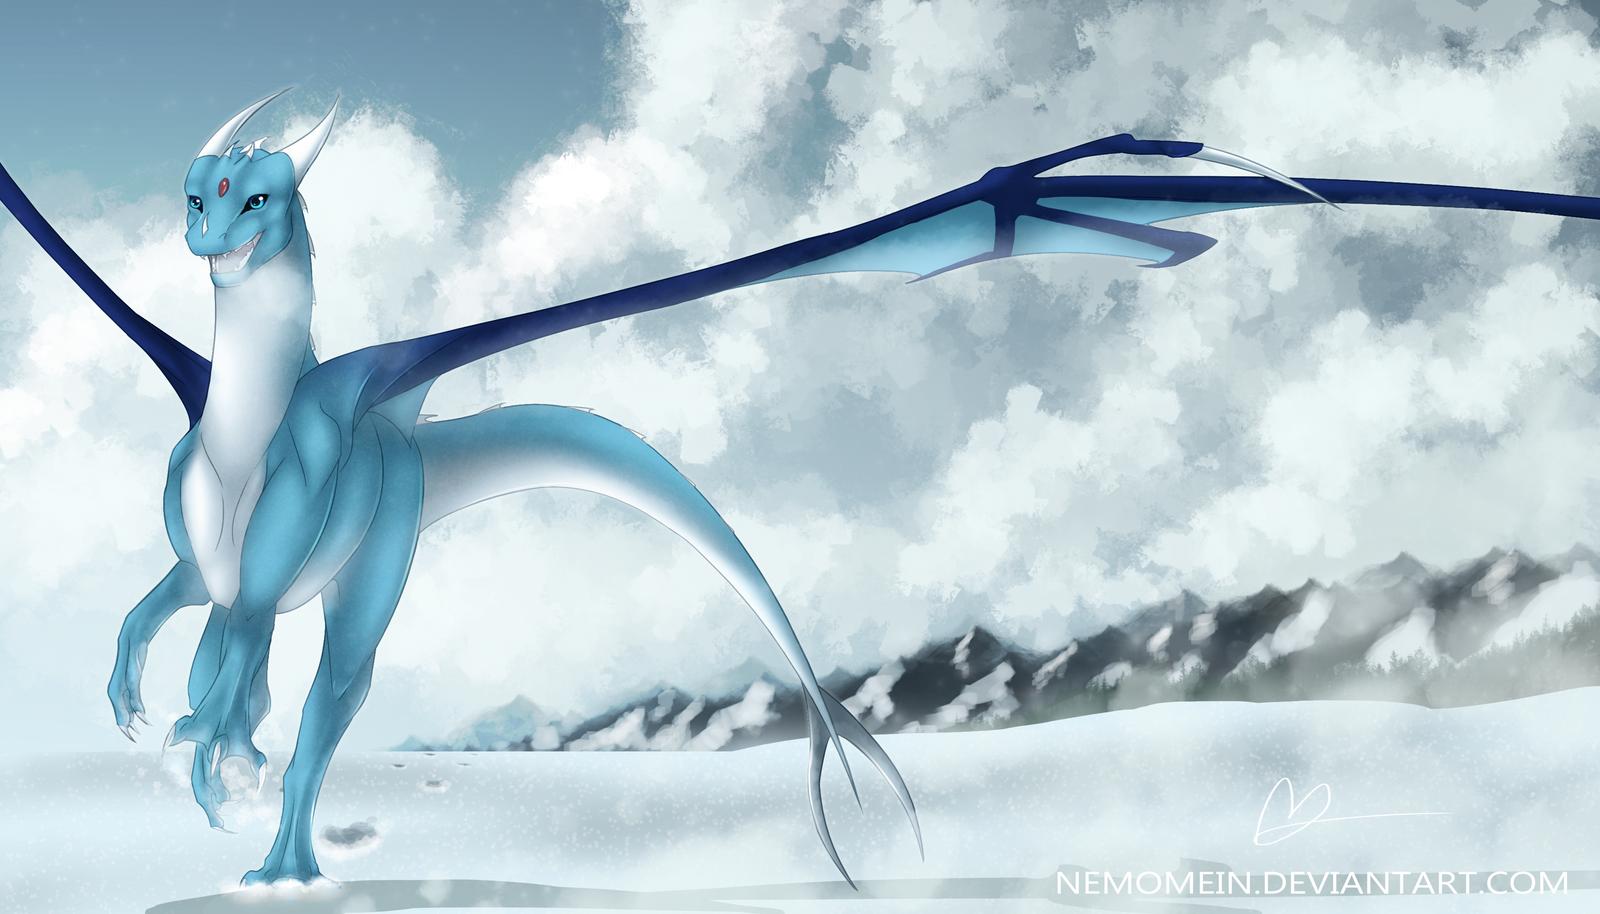 Snow Day by Nemomein